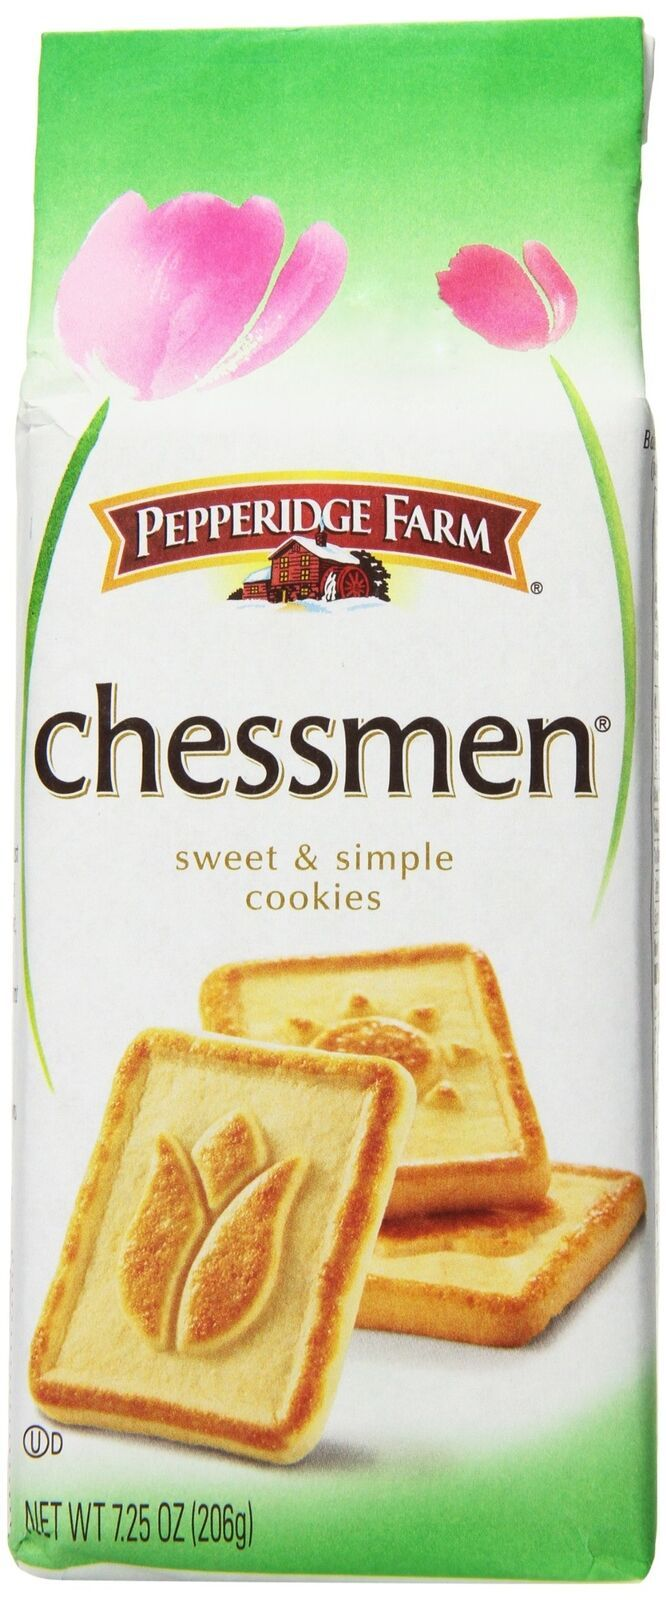 Pepperidge Farm Chessmen Cookies, 7.25 Ounce (Pack of 24)